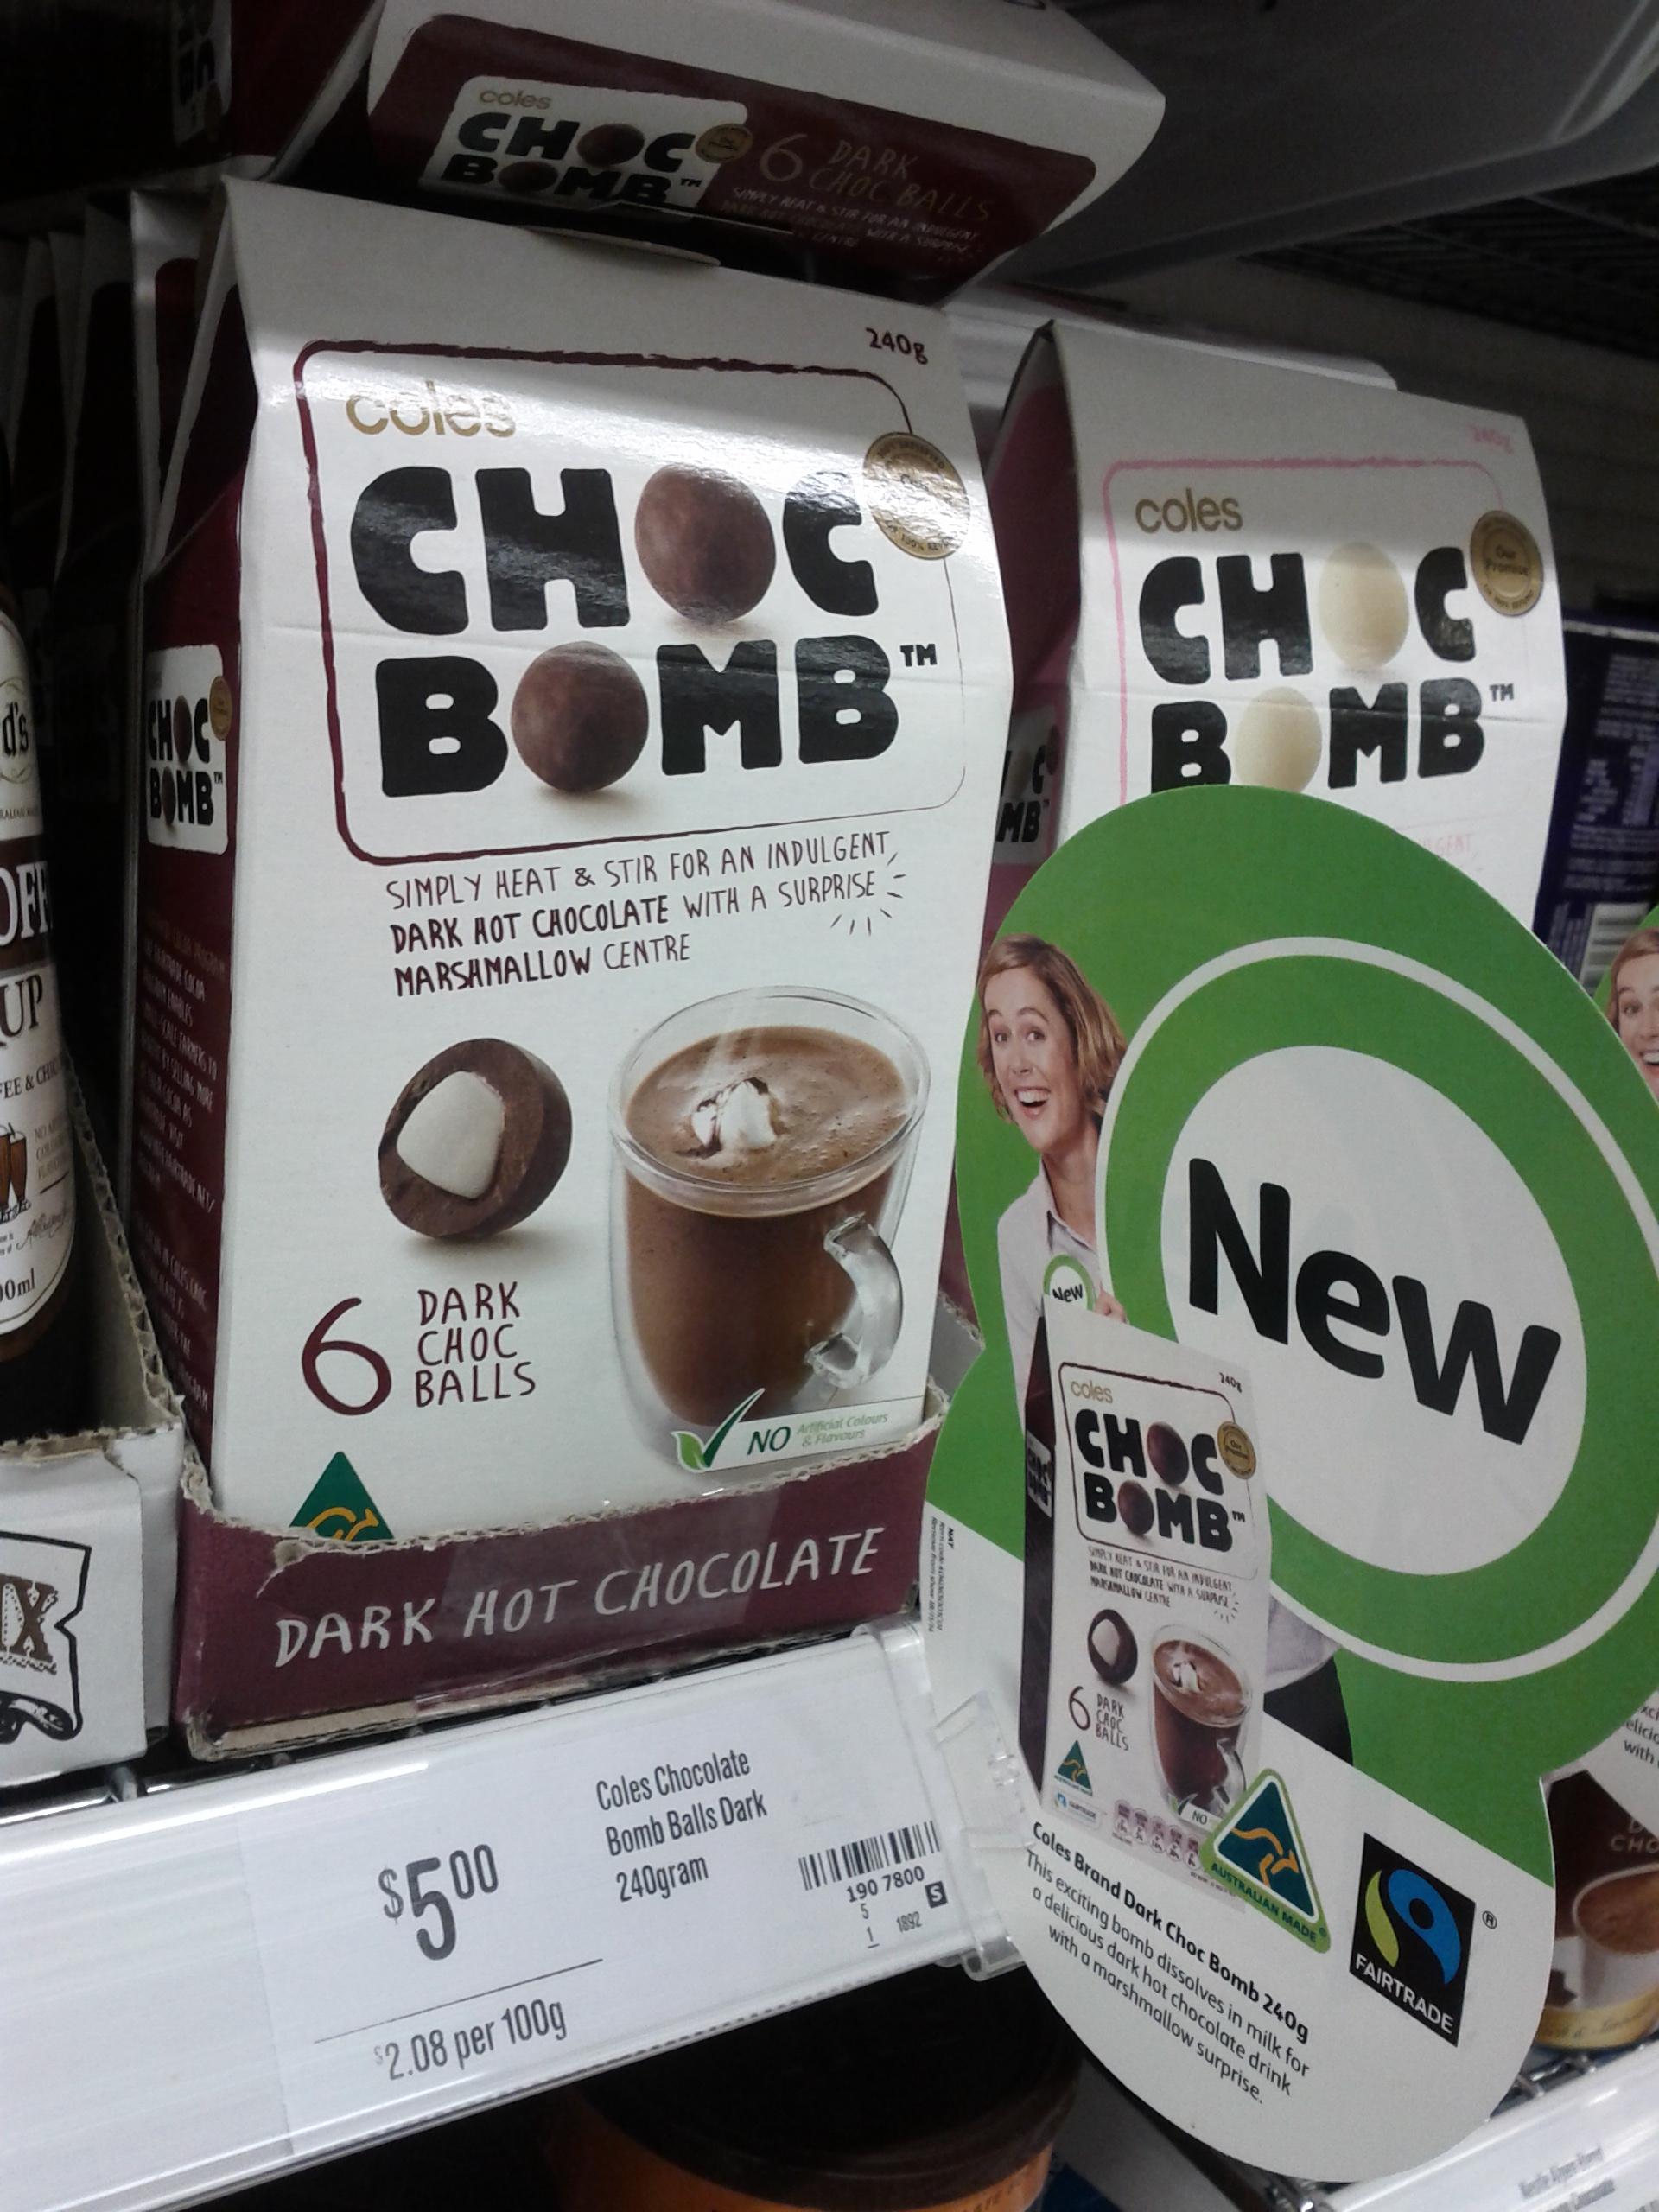 Coles 240g Choc Bomb Dark